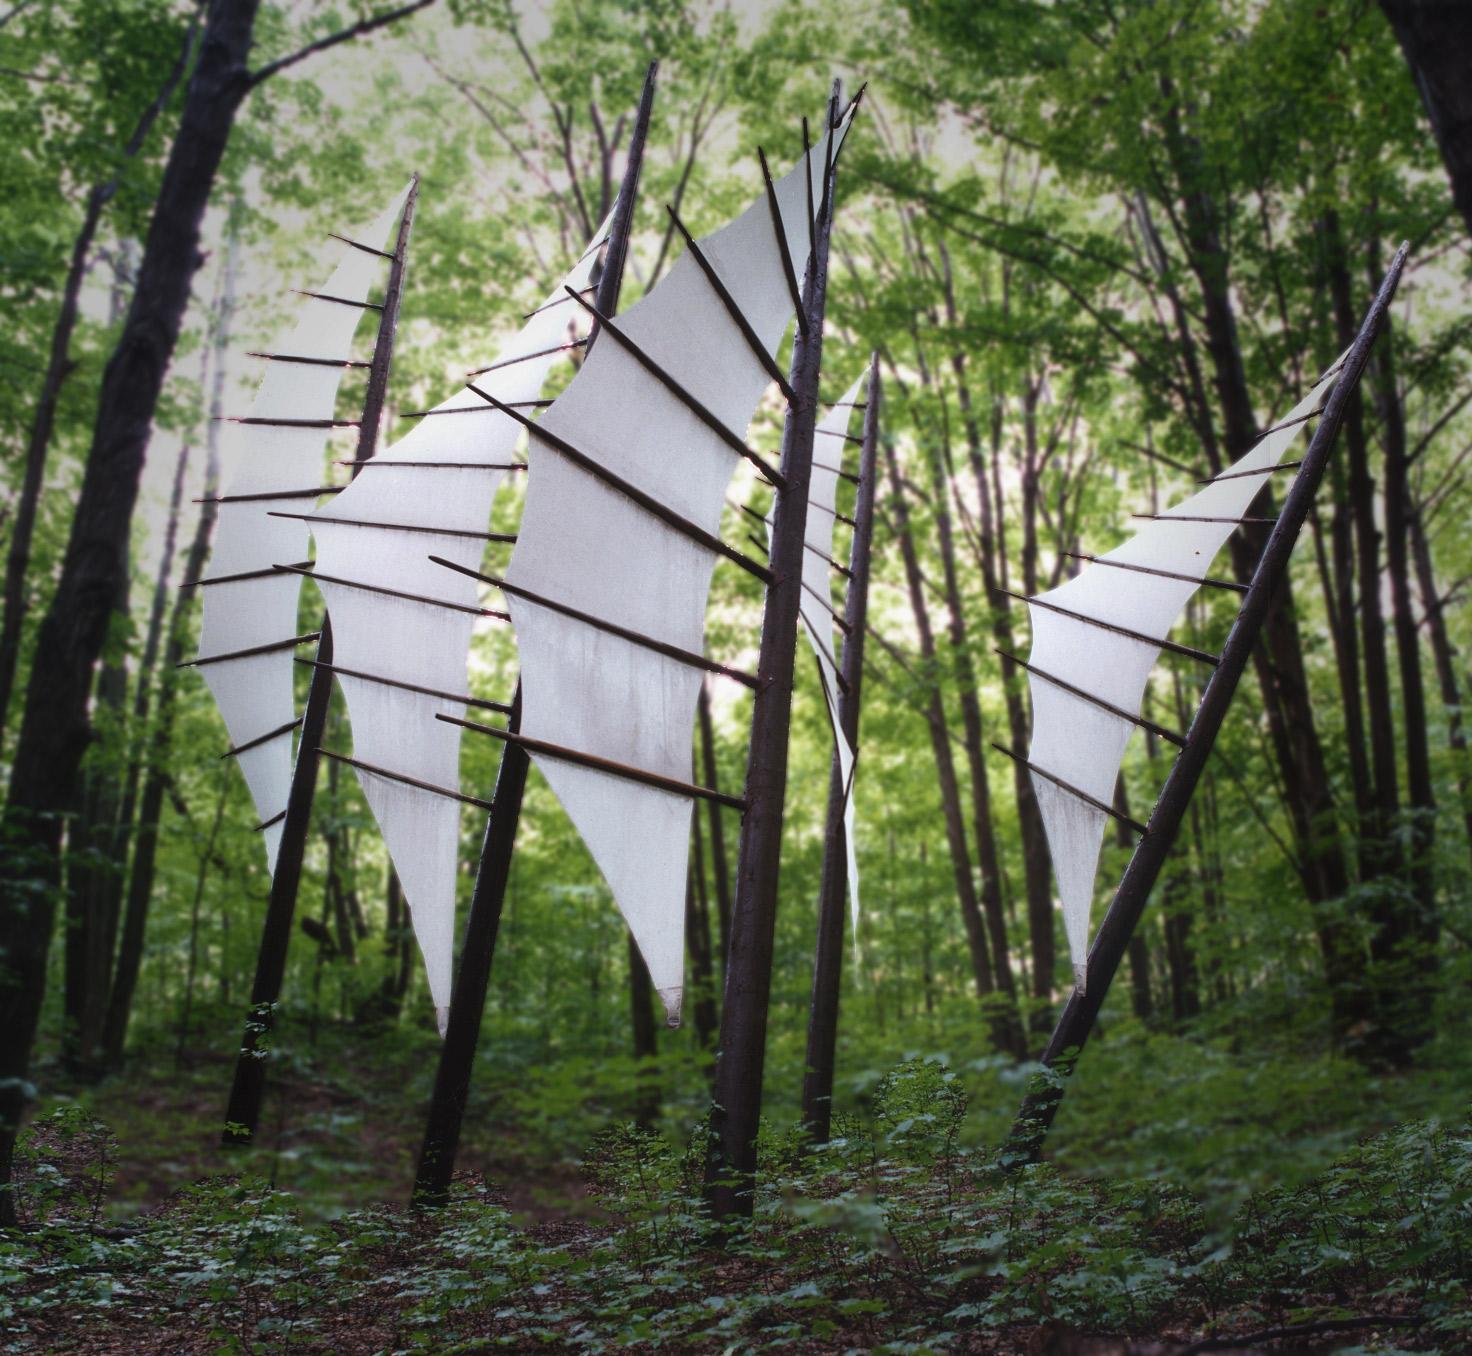 Five Needles by Michael McGillis